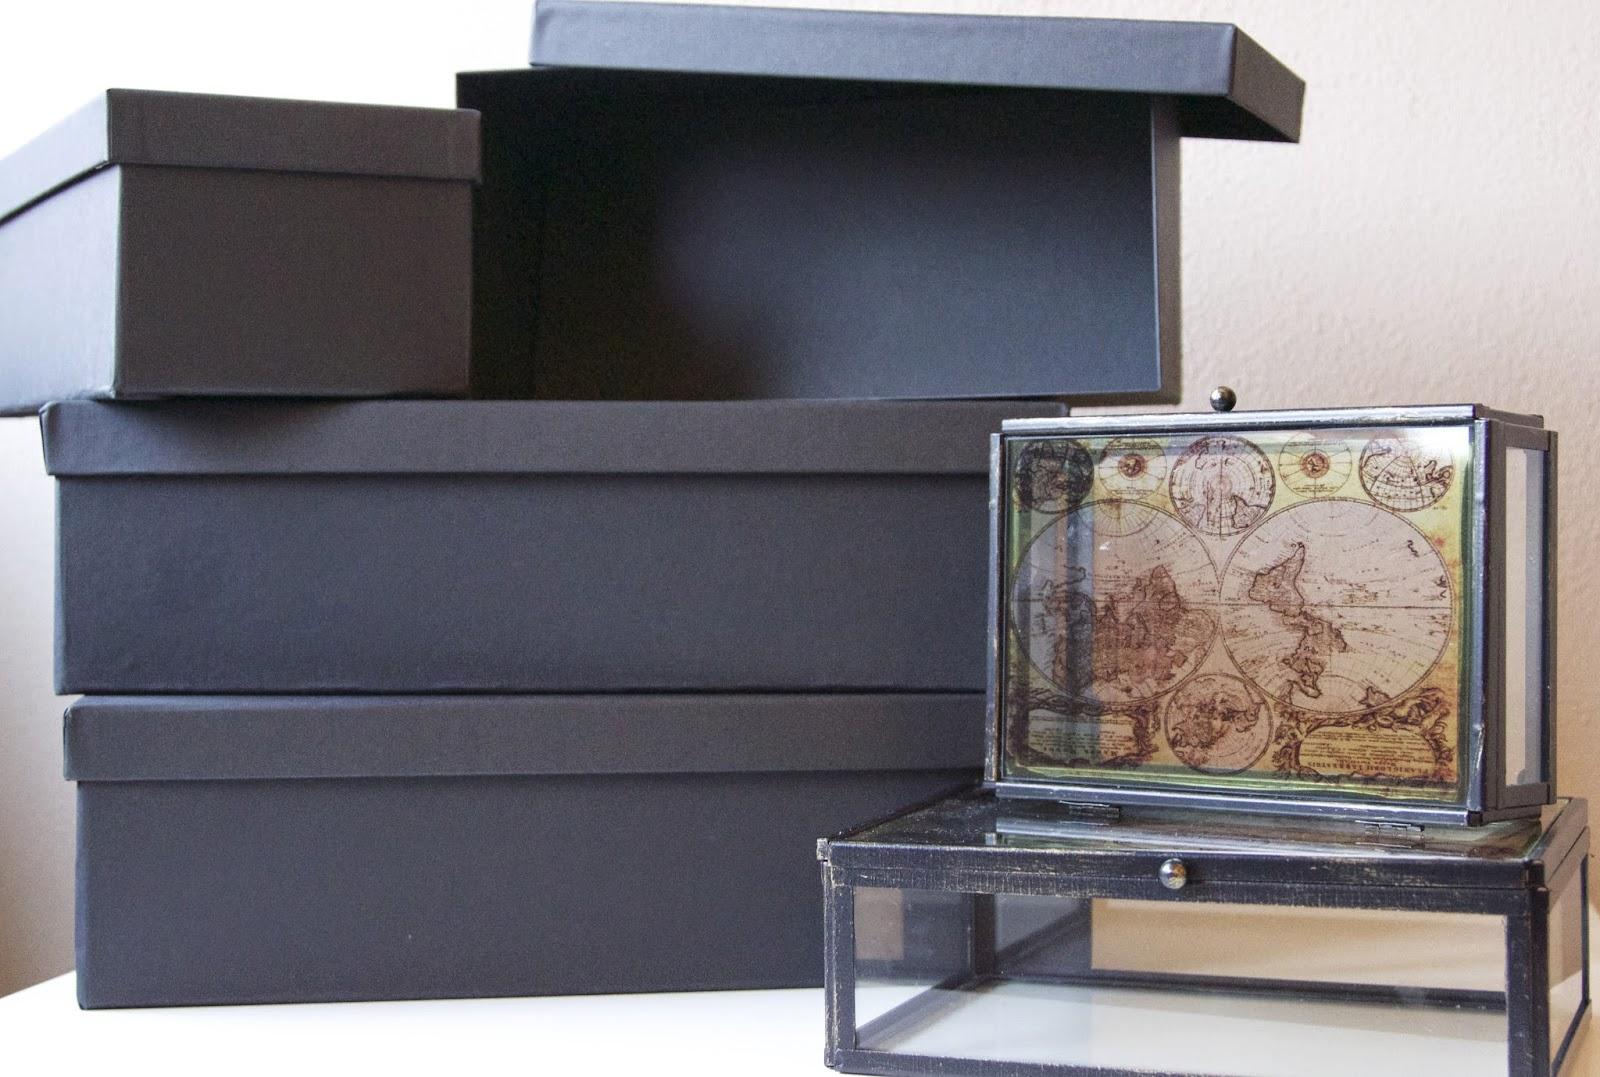 tjena ikea opbergdoos dozen box glazen kistjes xenos